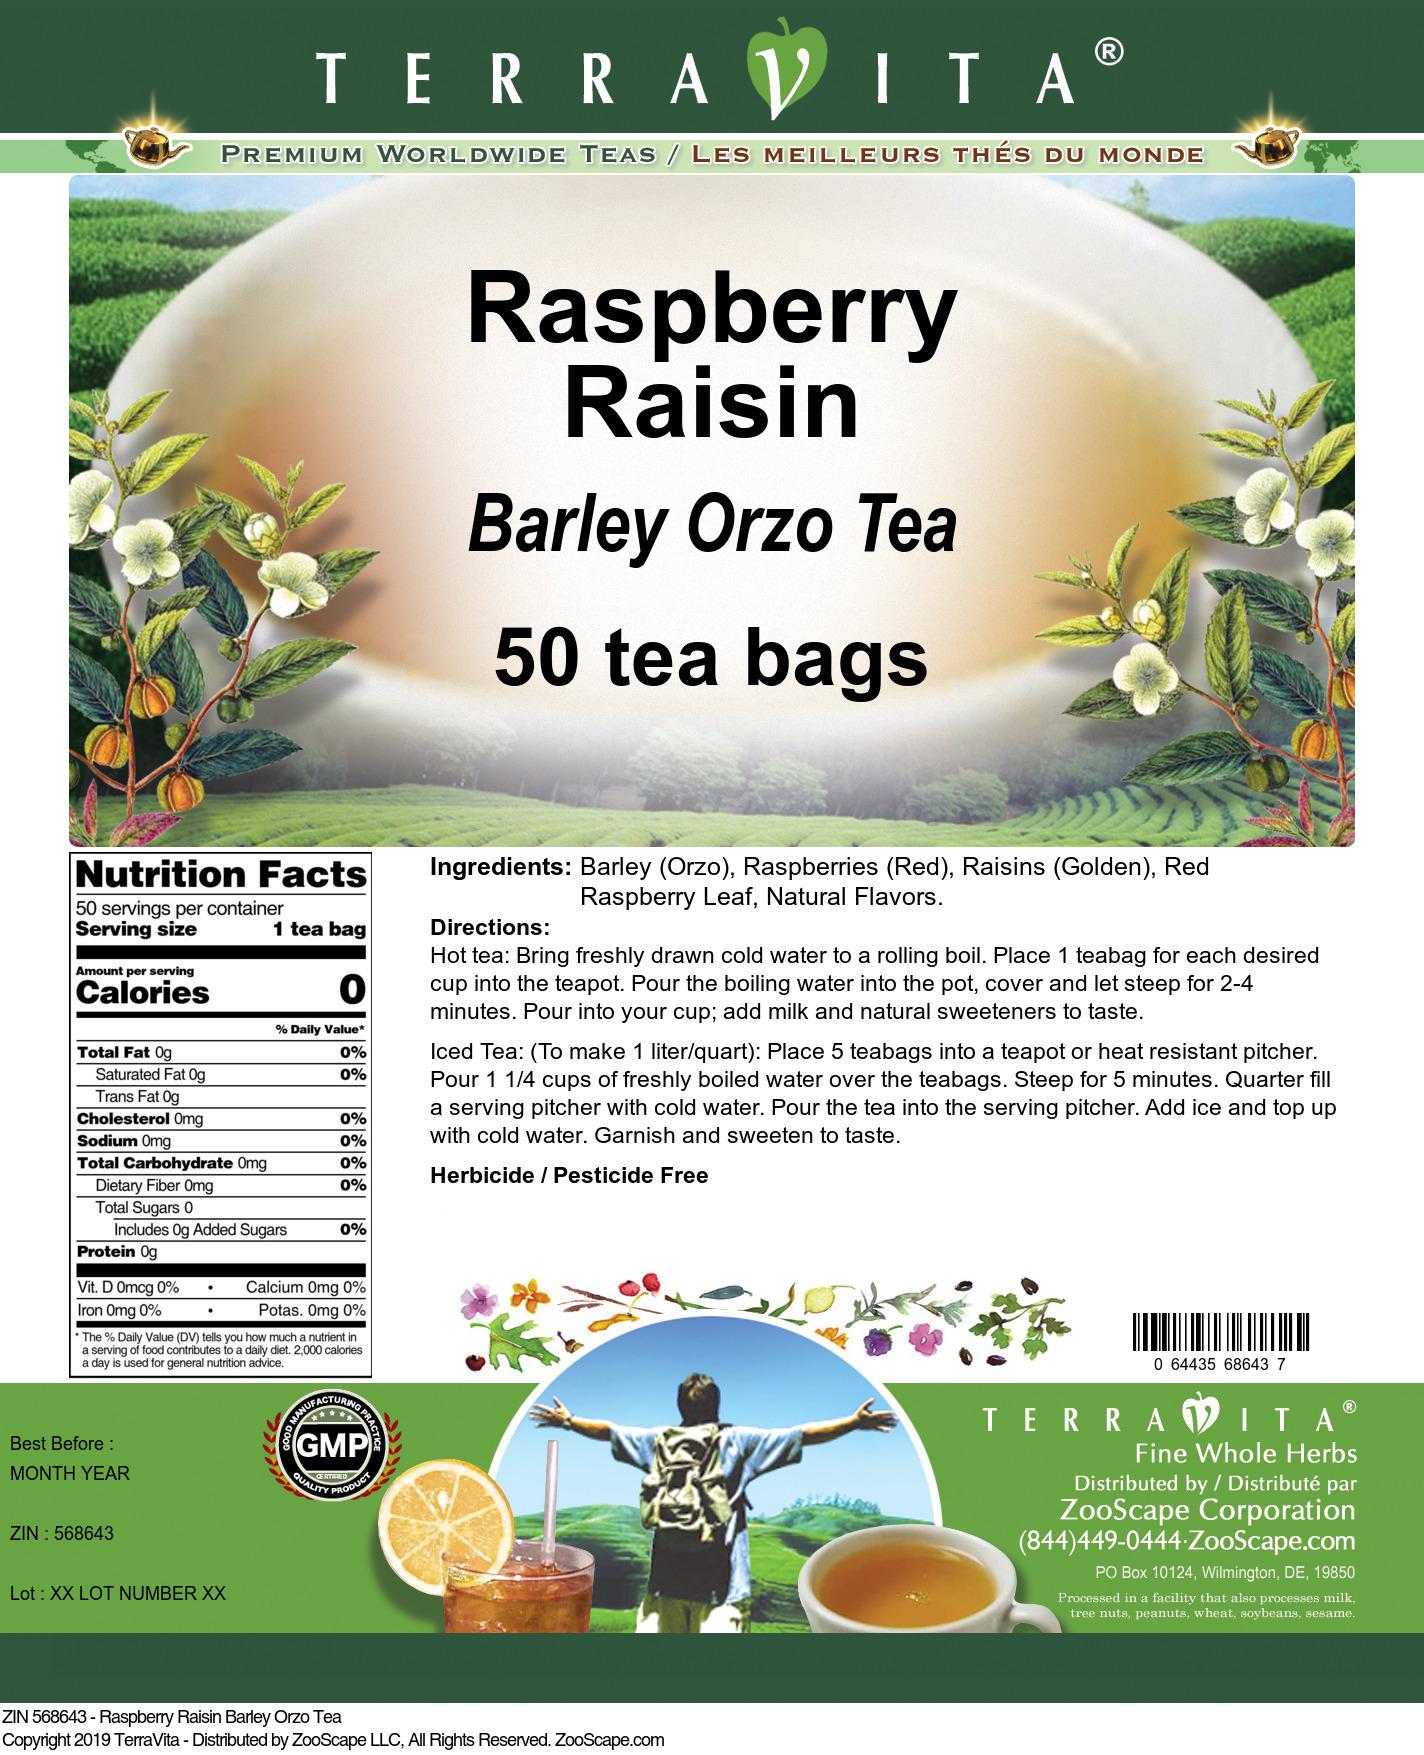 Raspberry Raisin Barley Orzo